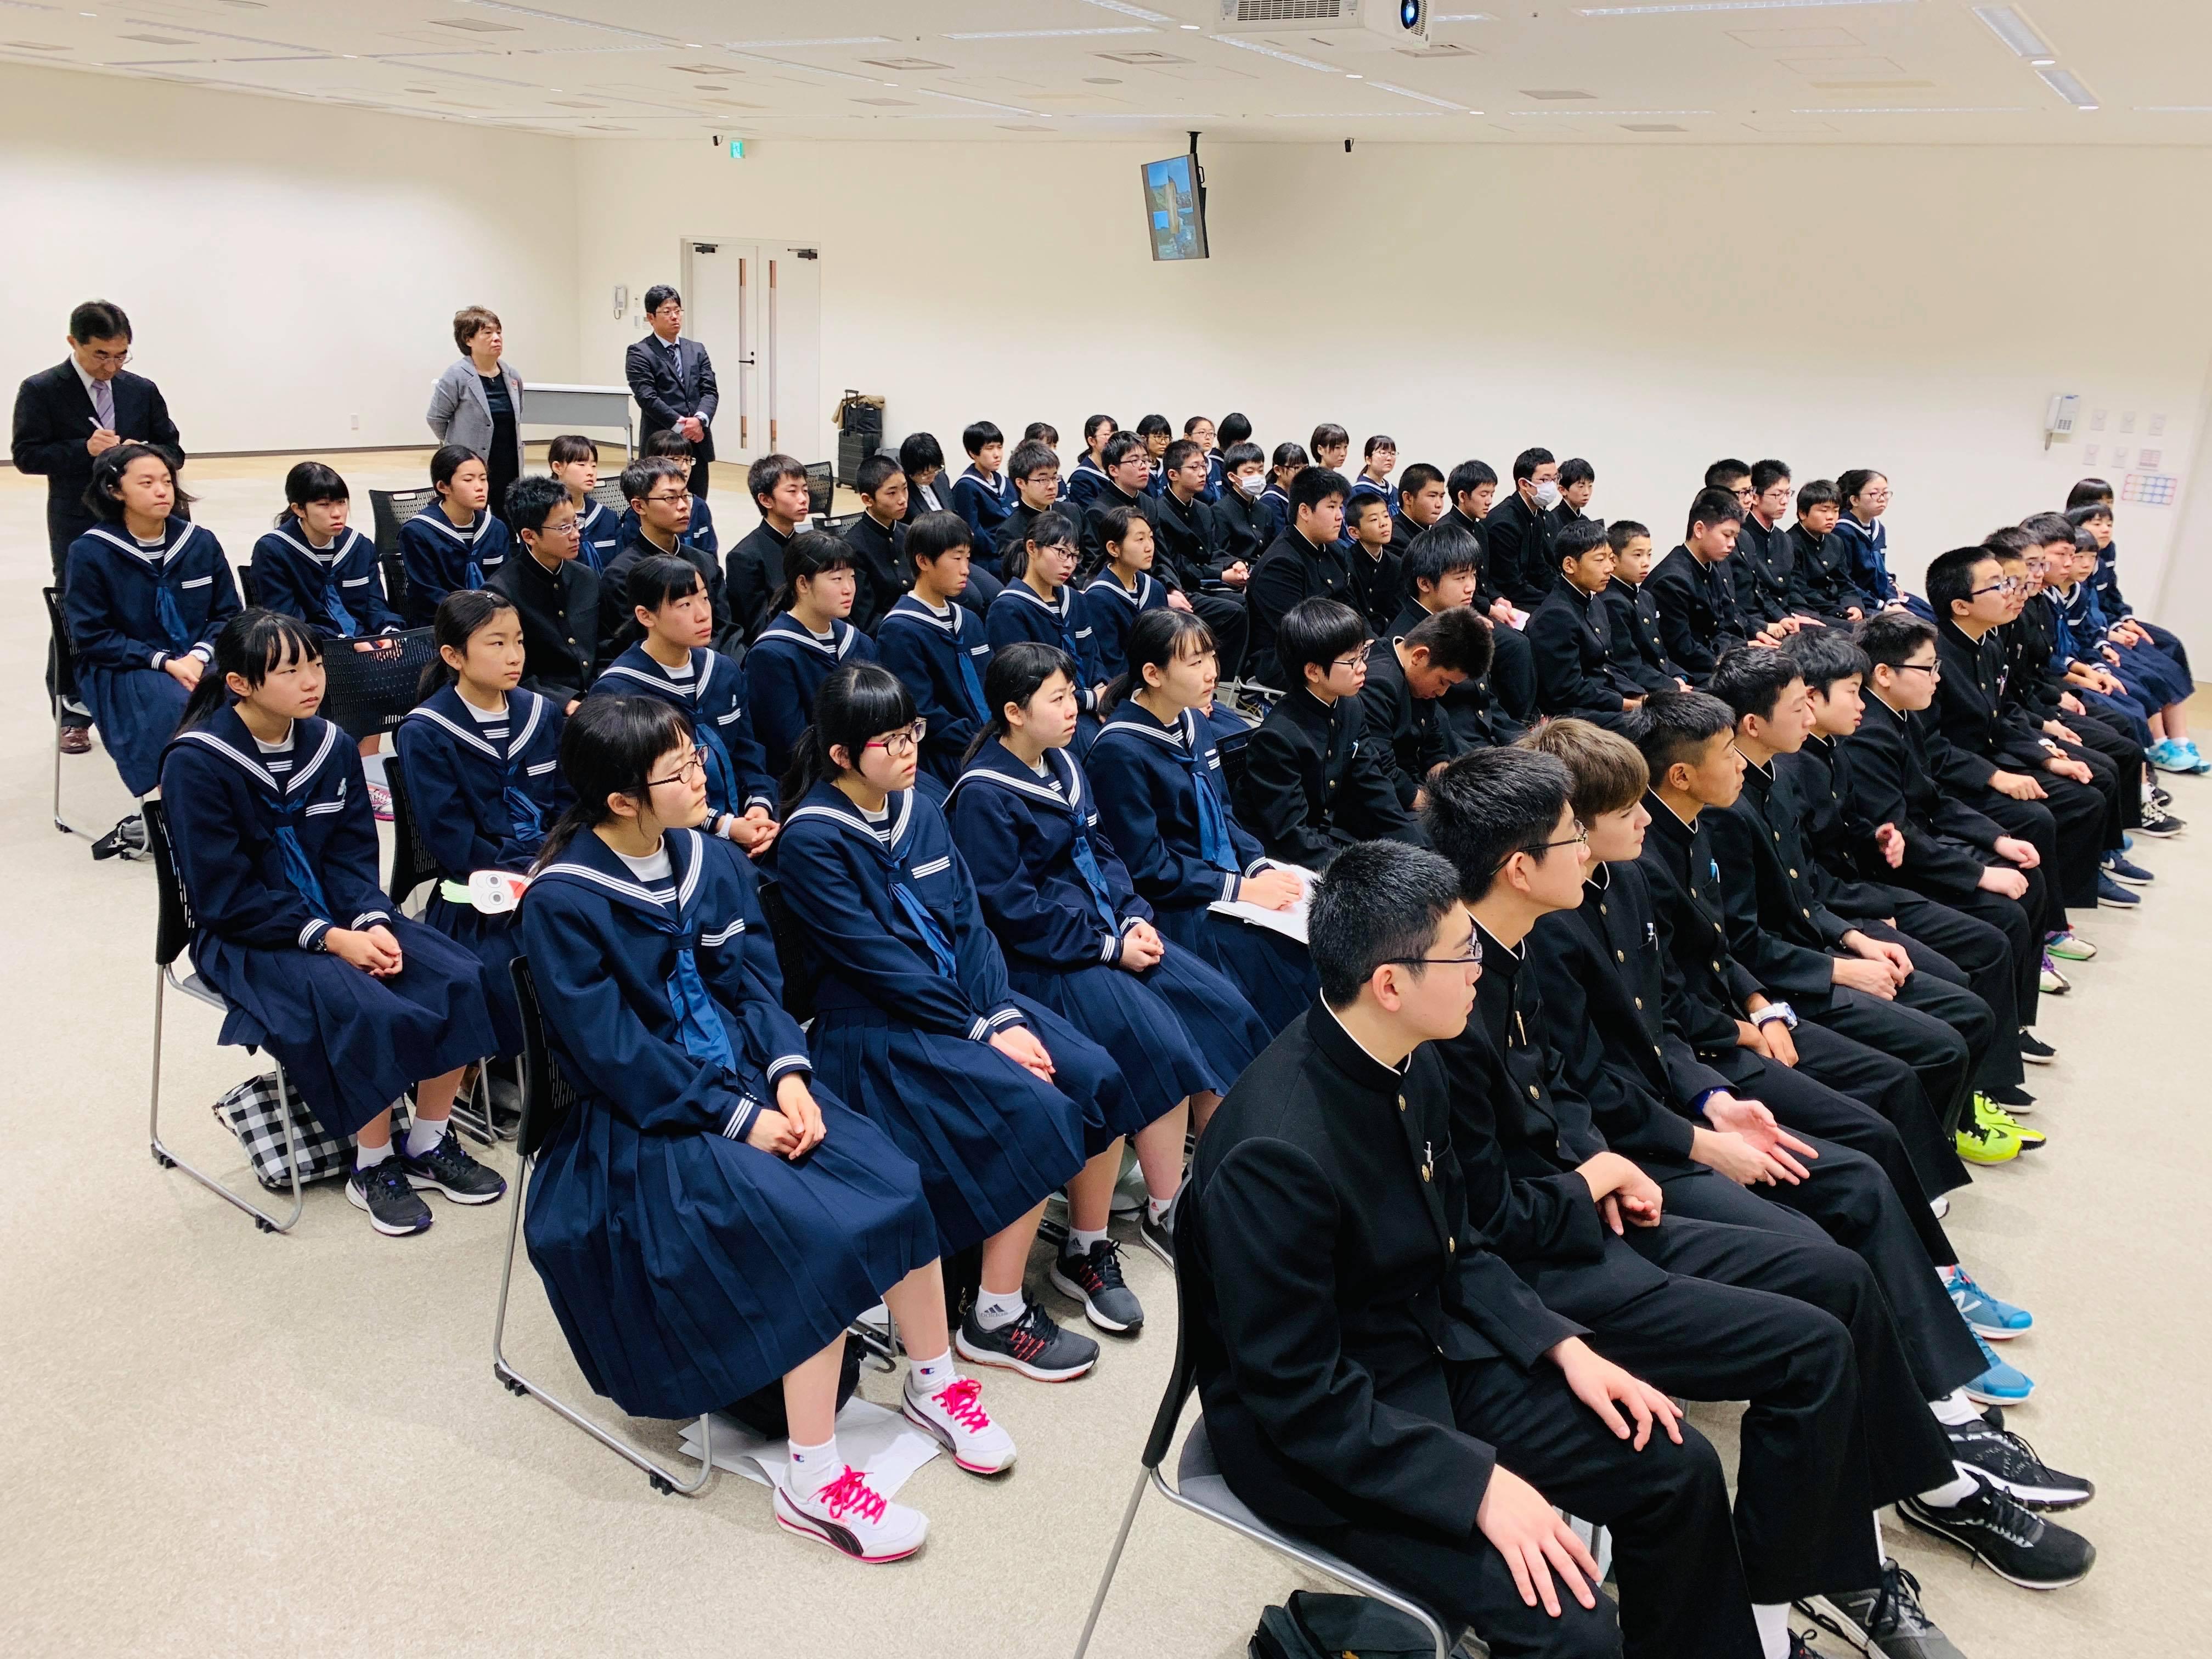 45488894 270900430231960 4378682895863119872 n - 2018年11月7日青森県東北中学校AFS(AOsukiフューチャーズゼミ)開催しました。